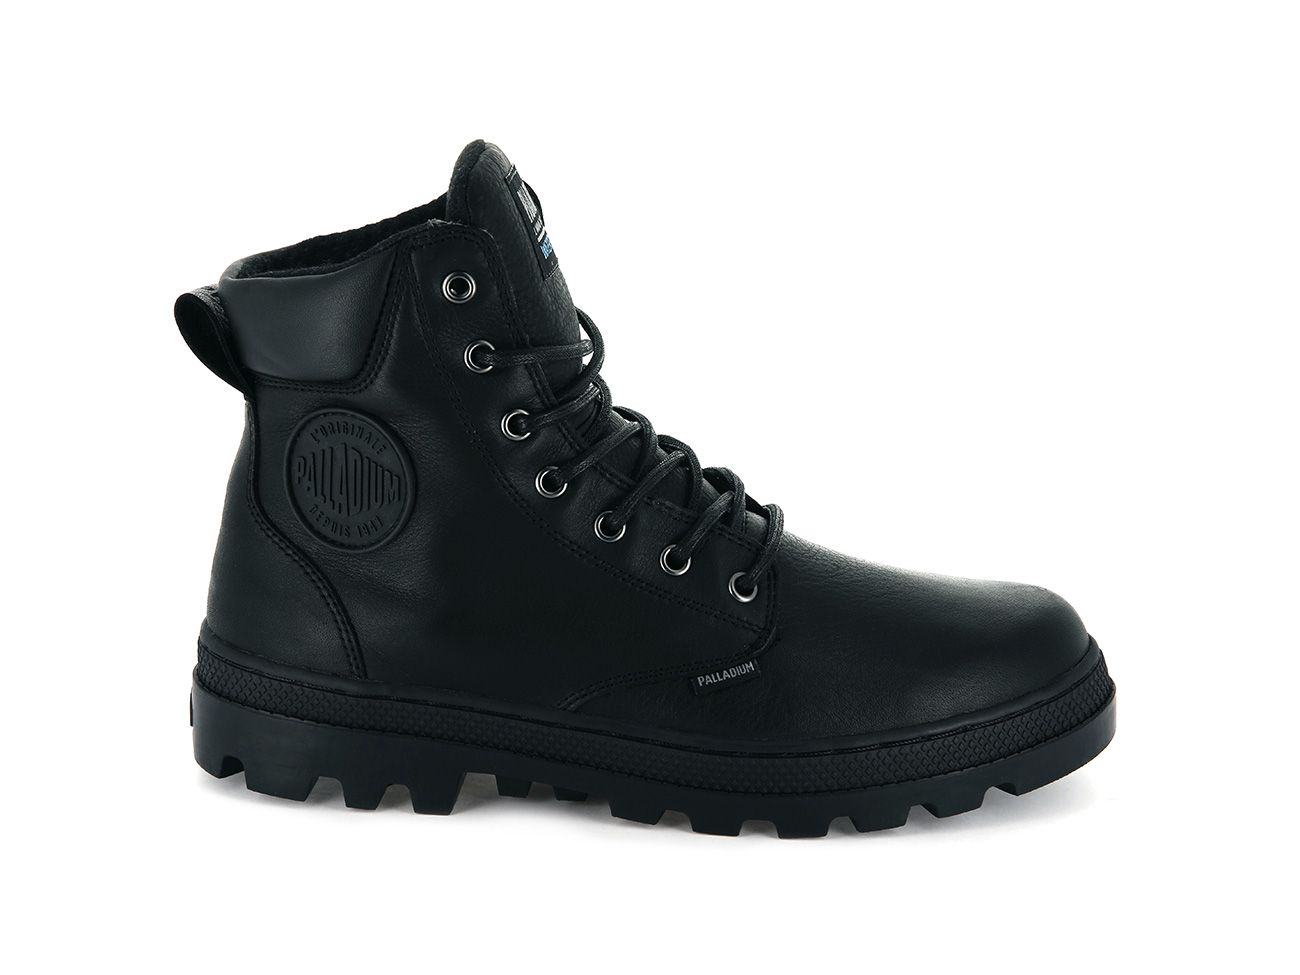 Palladium Pallabosse SC WP Leather in Black/Black